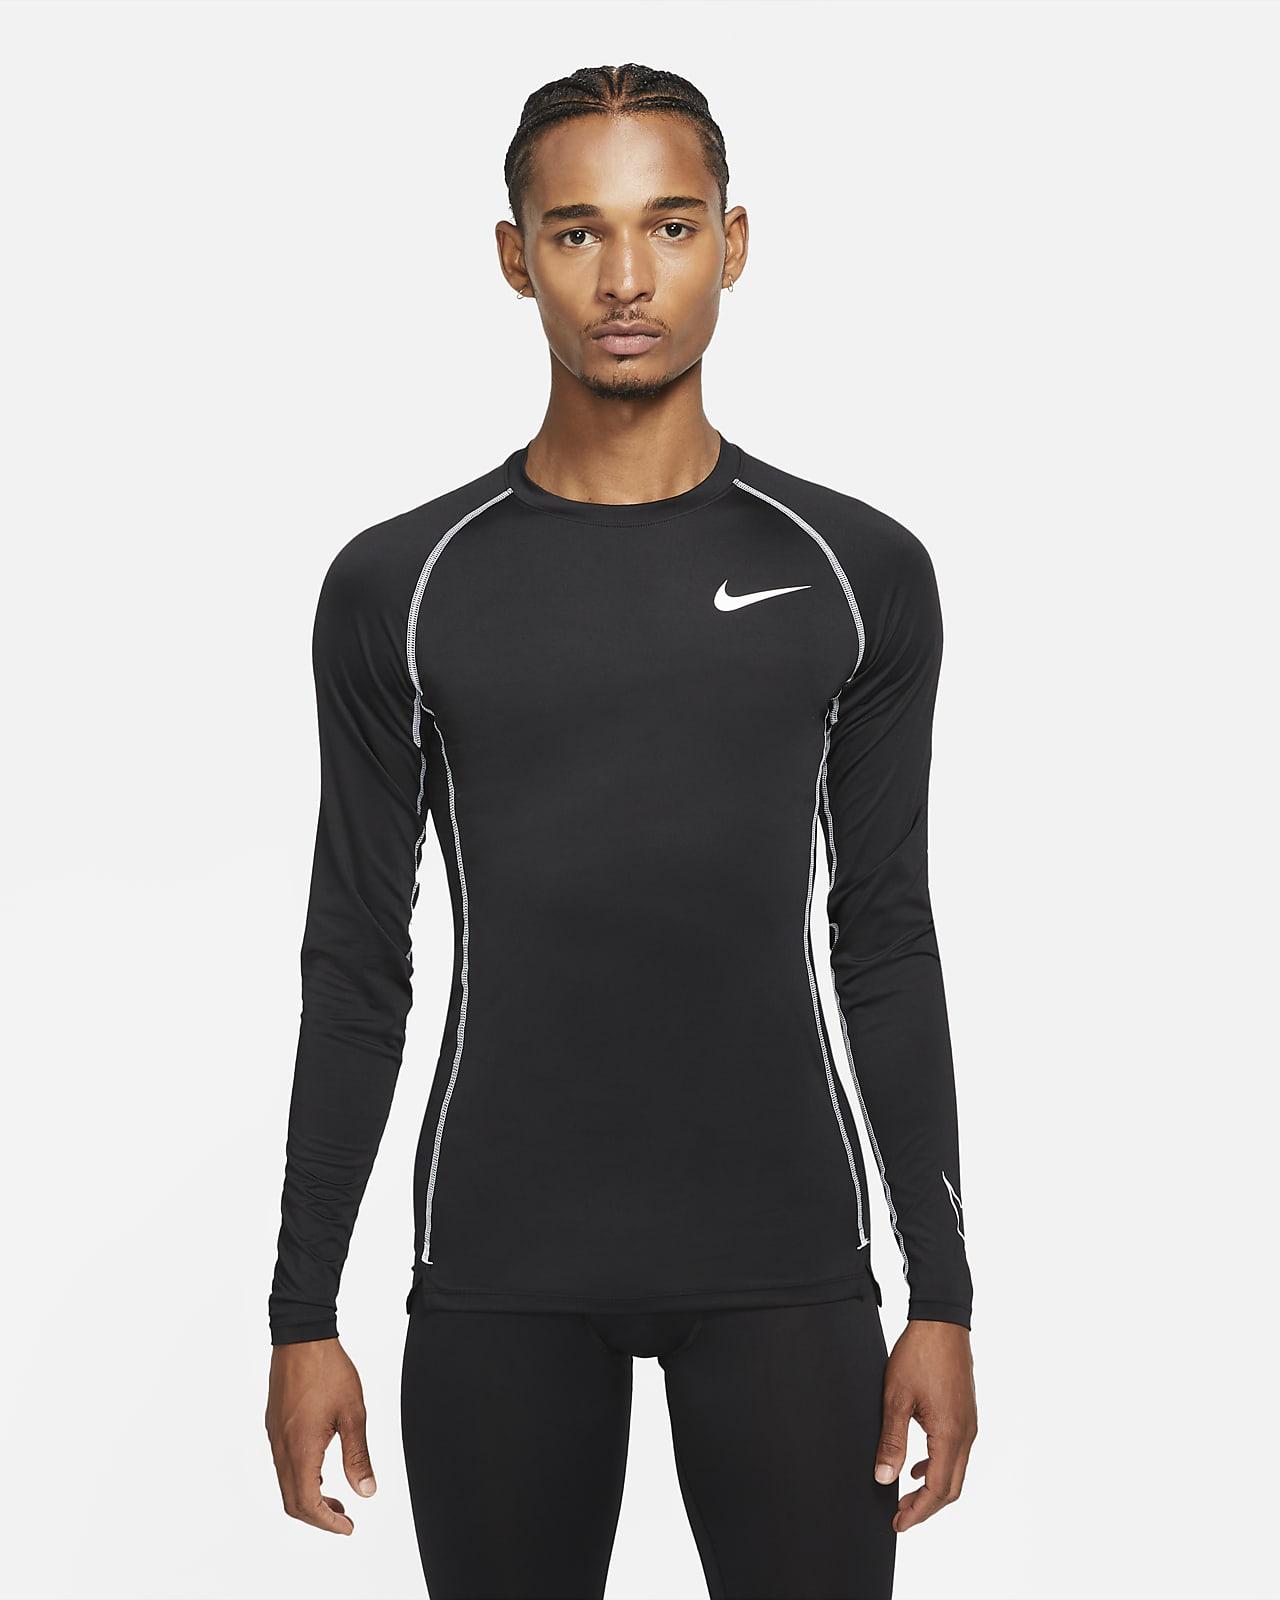 Nike Pro Dri-FIT Men's Tight-Fit Long-Sleeve Top